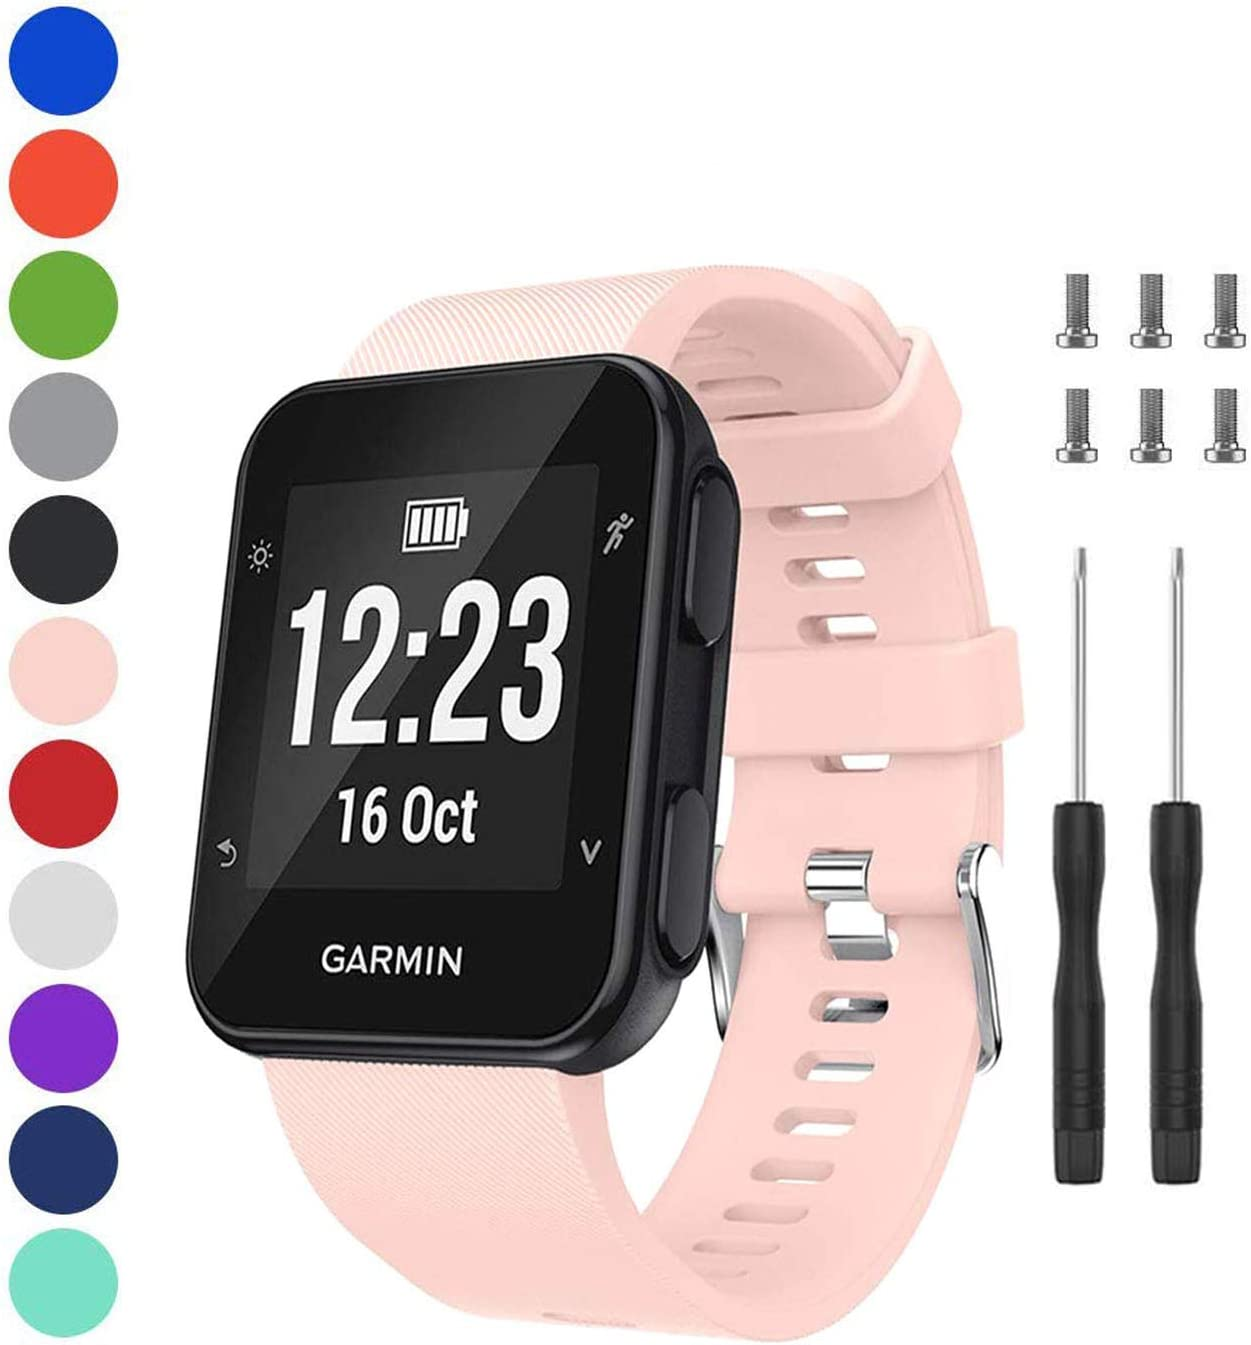 PSALMS for Garmin Forerunner 35 Band,Unisex Garmin Silicone Wristband Compatible with Garmin Forerunner 35 Smartwatch(Pink)